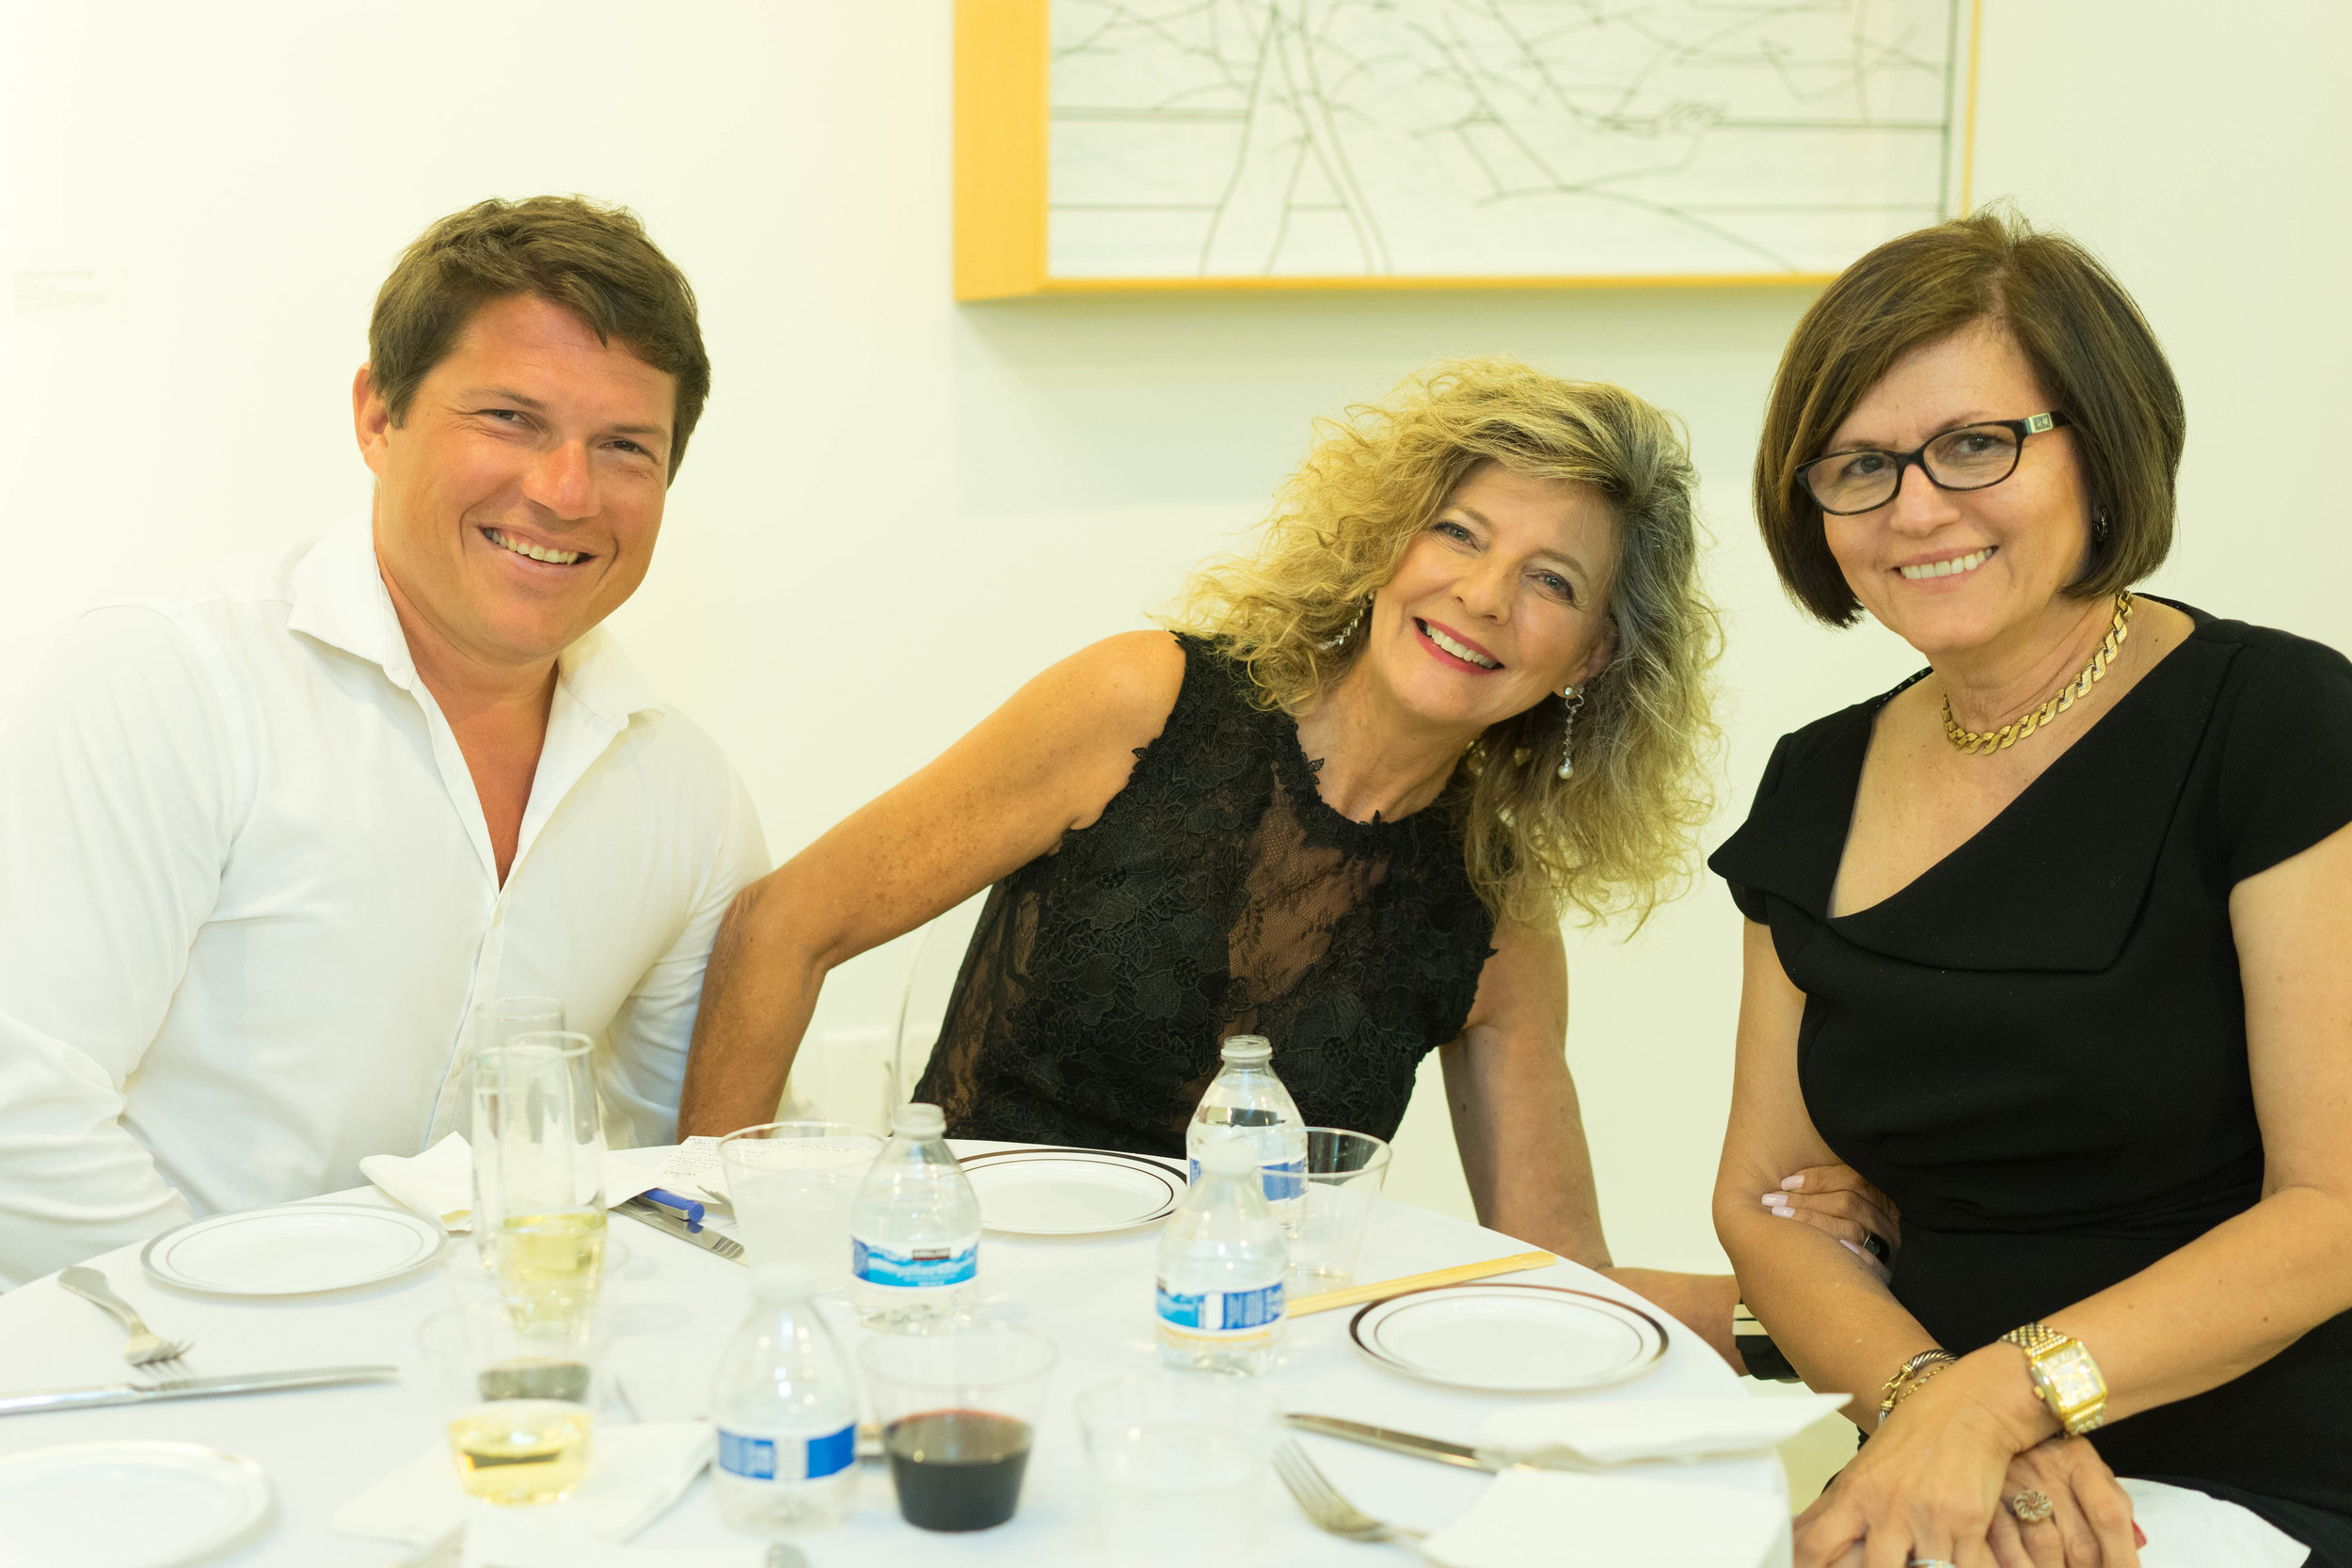 Ryan, Margarita and Norma.jpg